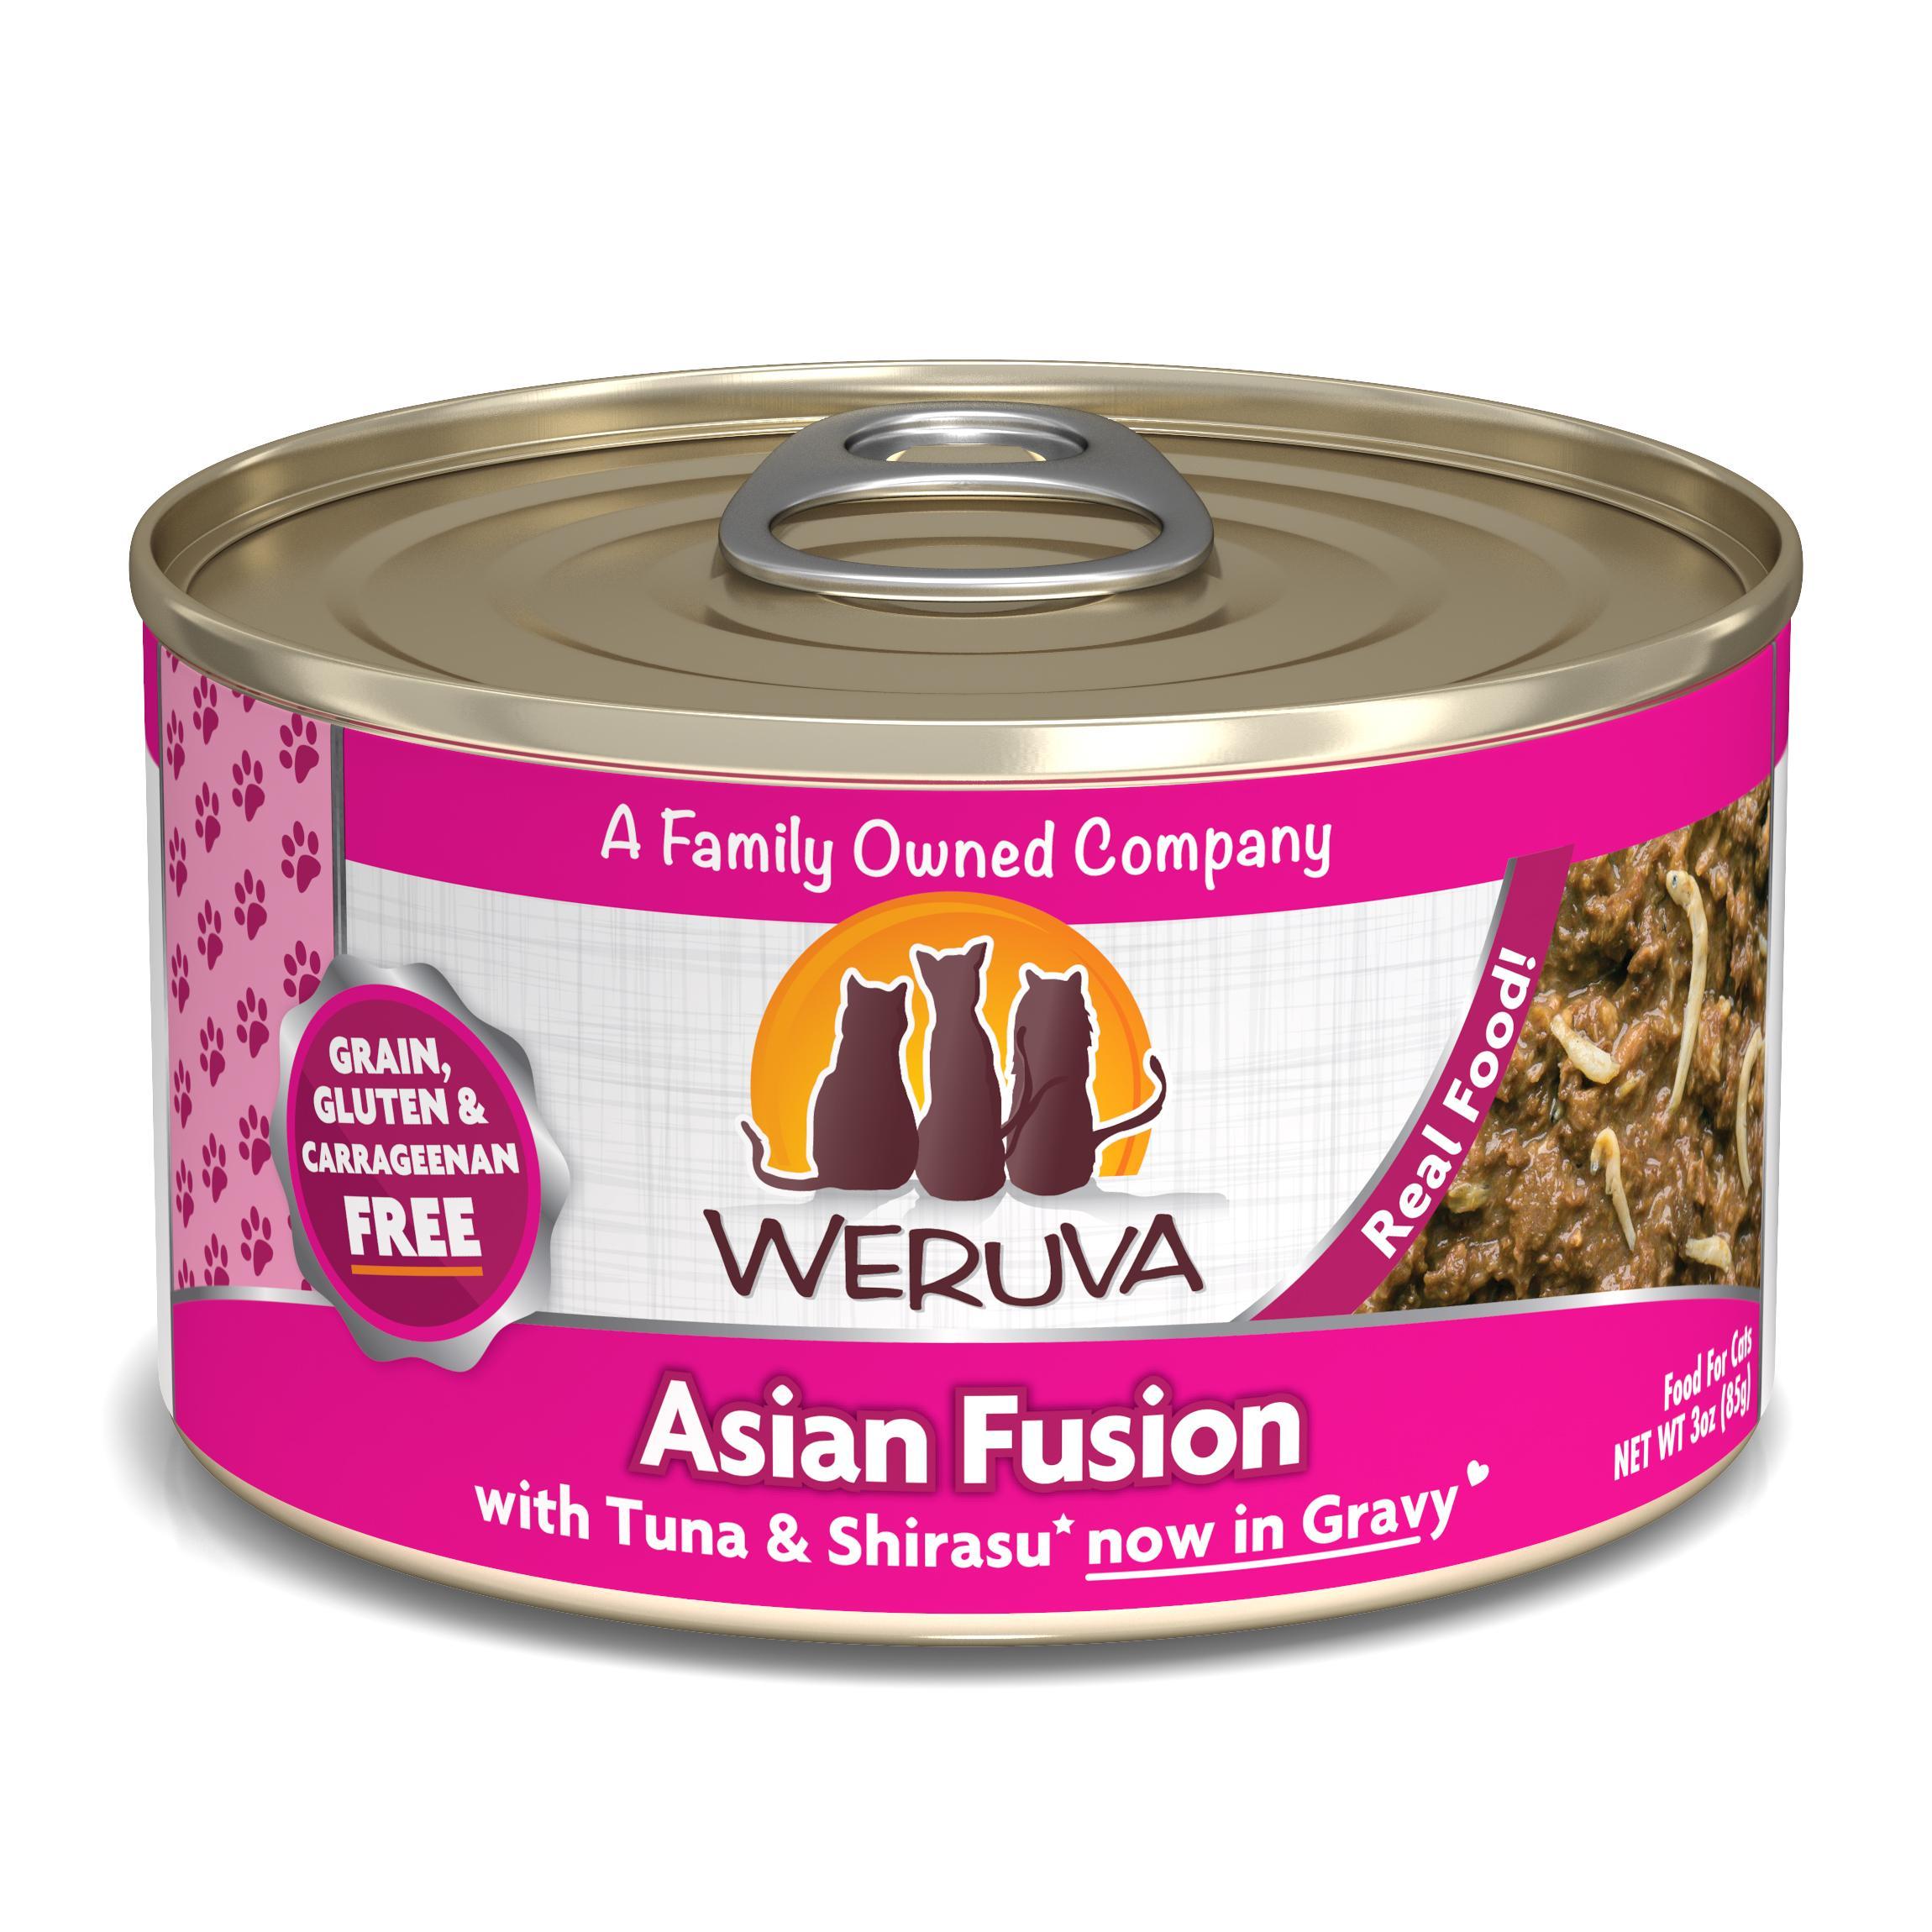 Weruva Cat Classic Asian Fusion with Tuna & Shirasu Grain-Free Wet Cat Food Image